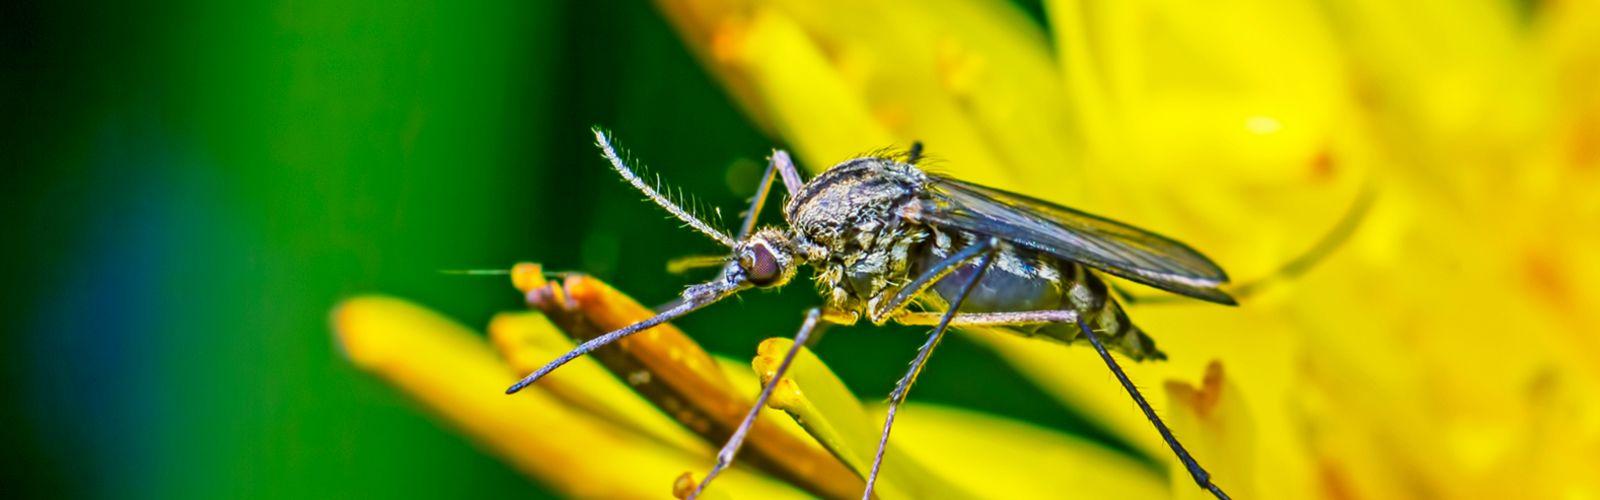 Mosquitos on plant